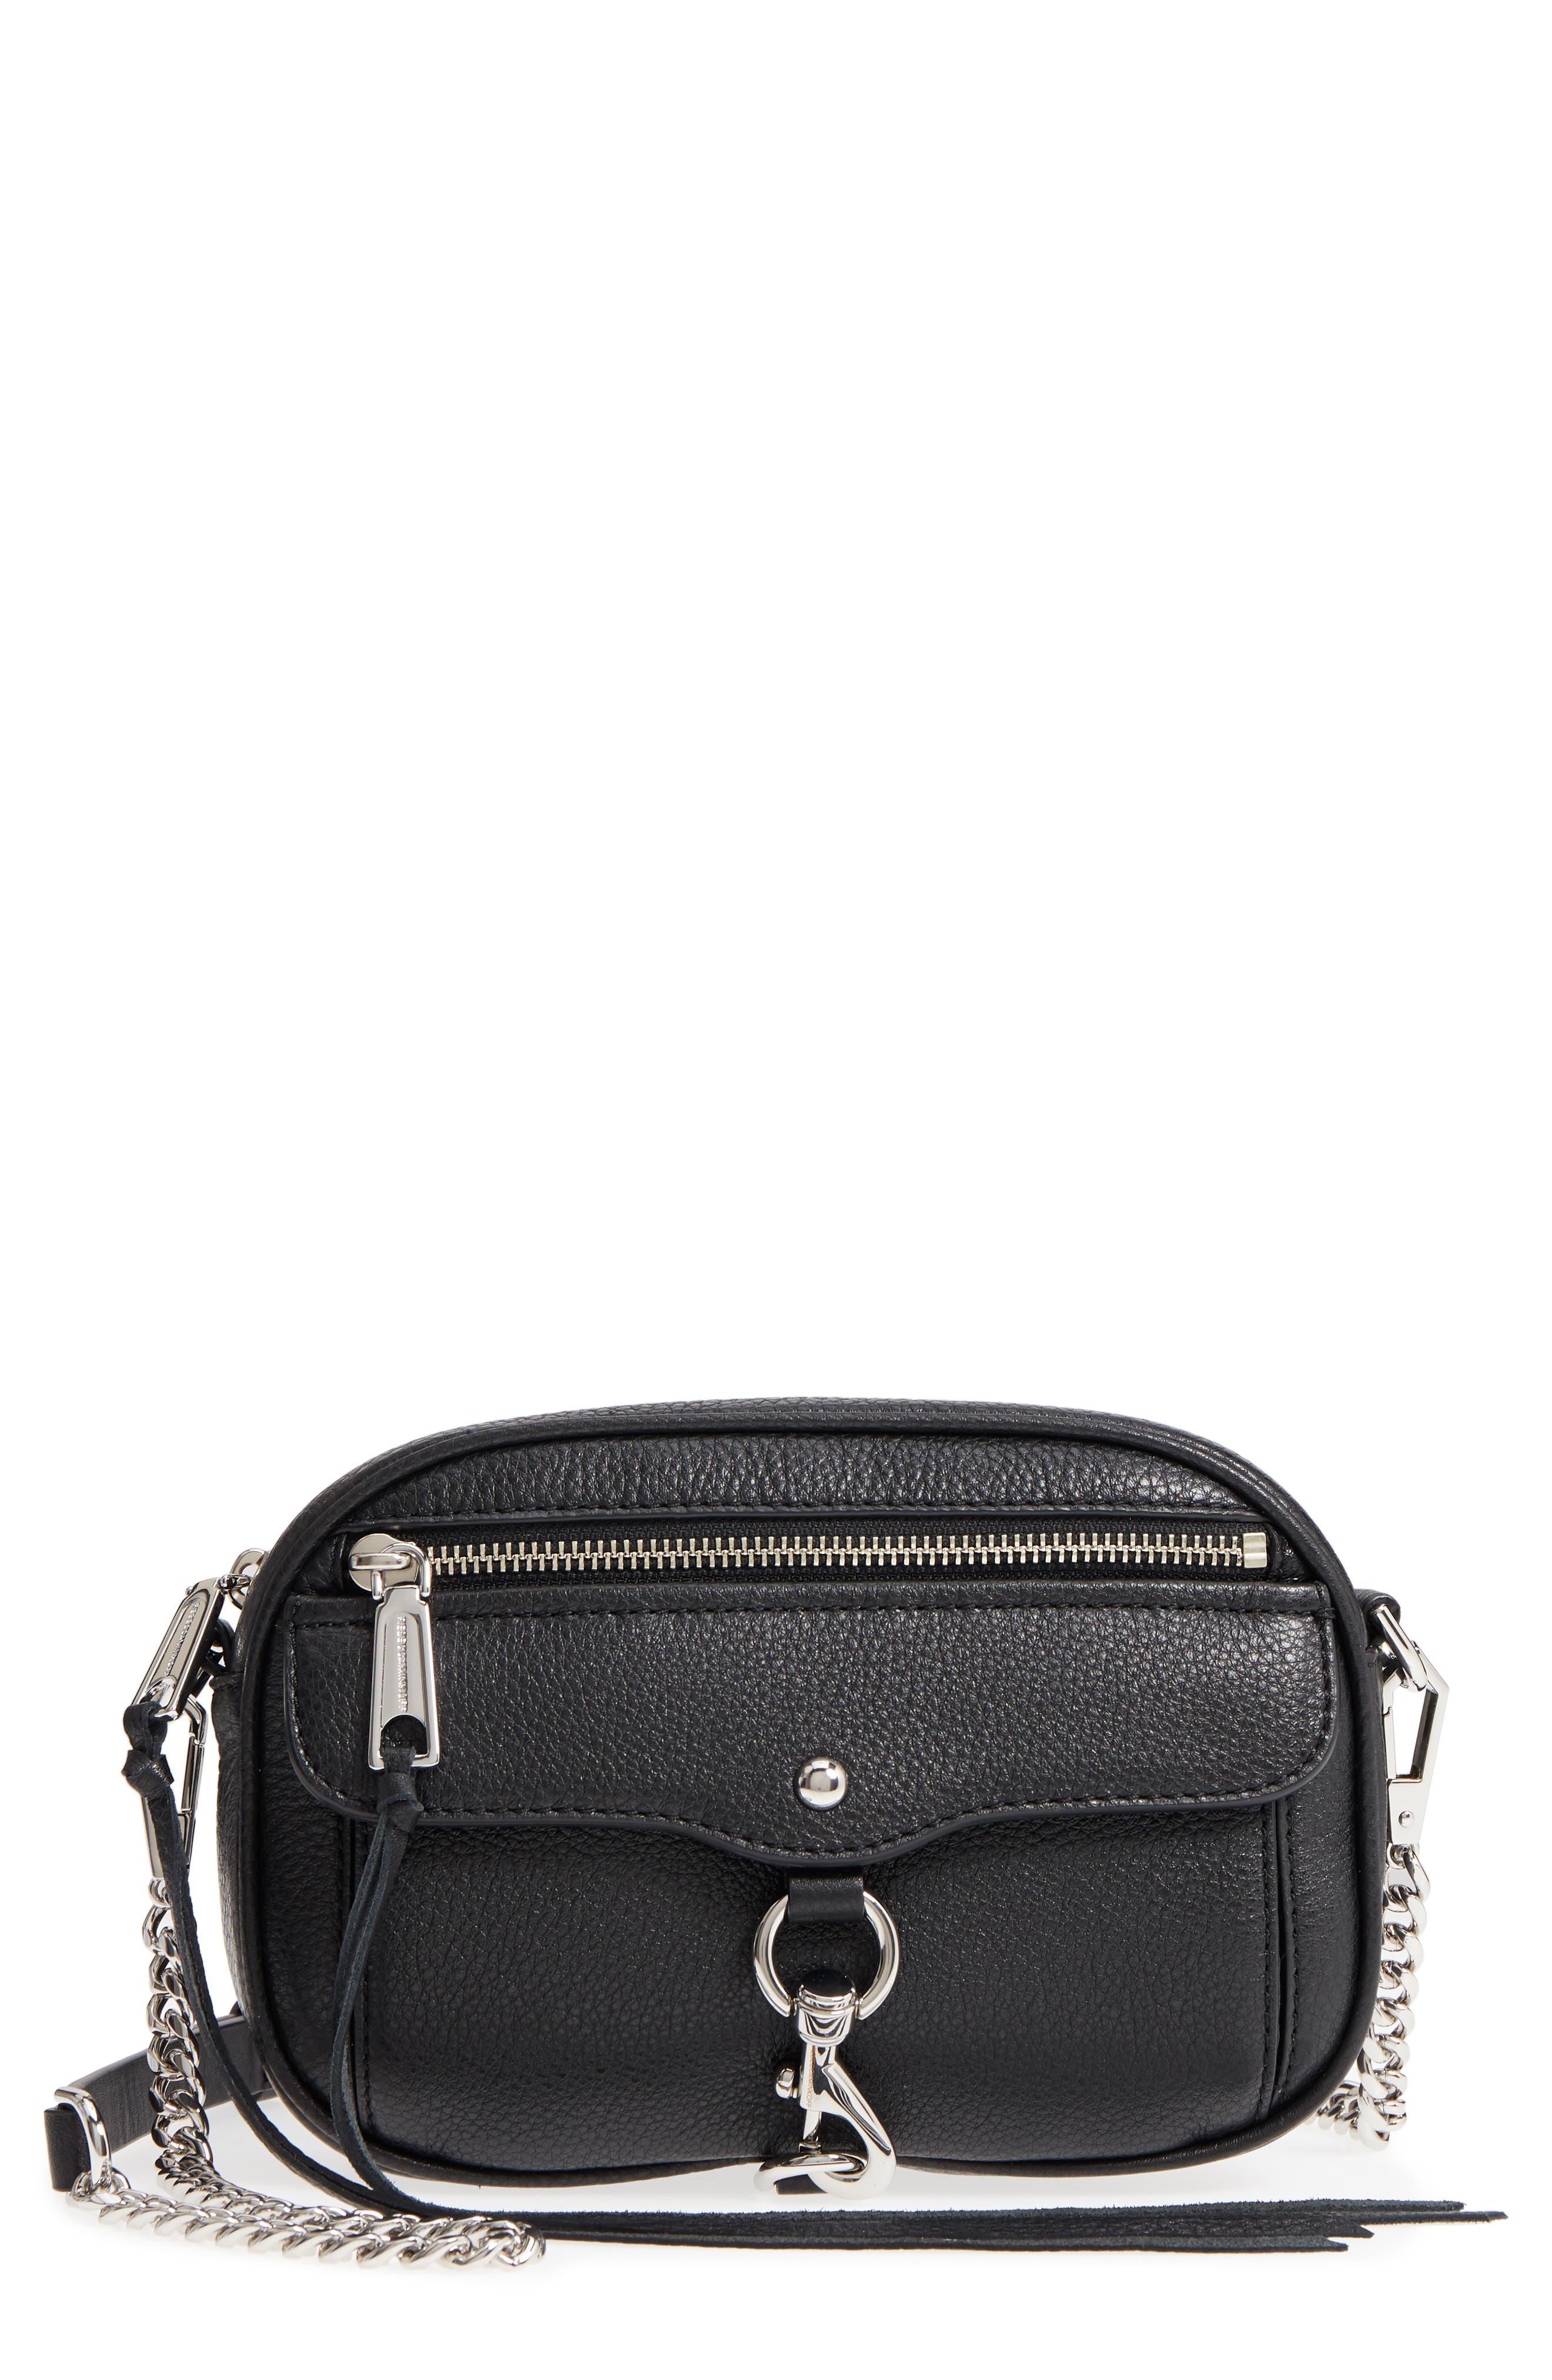 REBECCA MINKOFF Blythe Leather Crossbody Bag, Main, color, BLACK